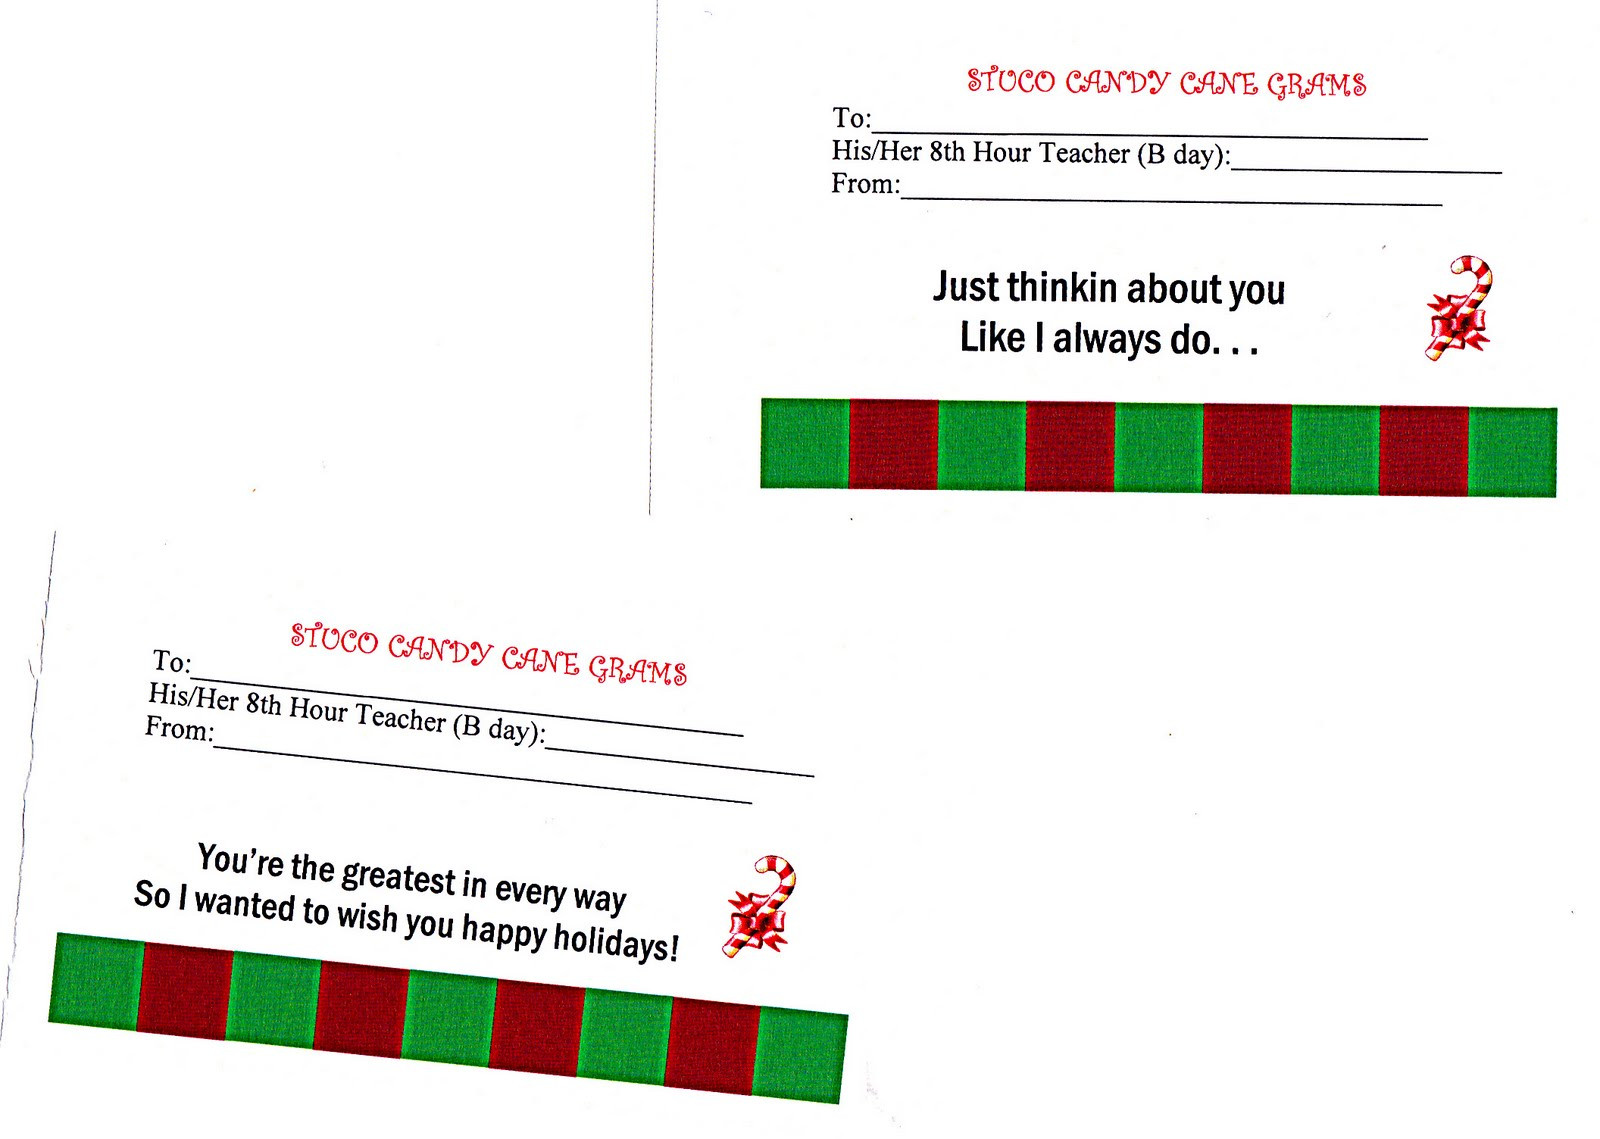 Christmas Candy Gram Template  writingmagic26 Candy Cane Grams